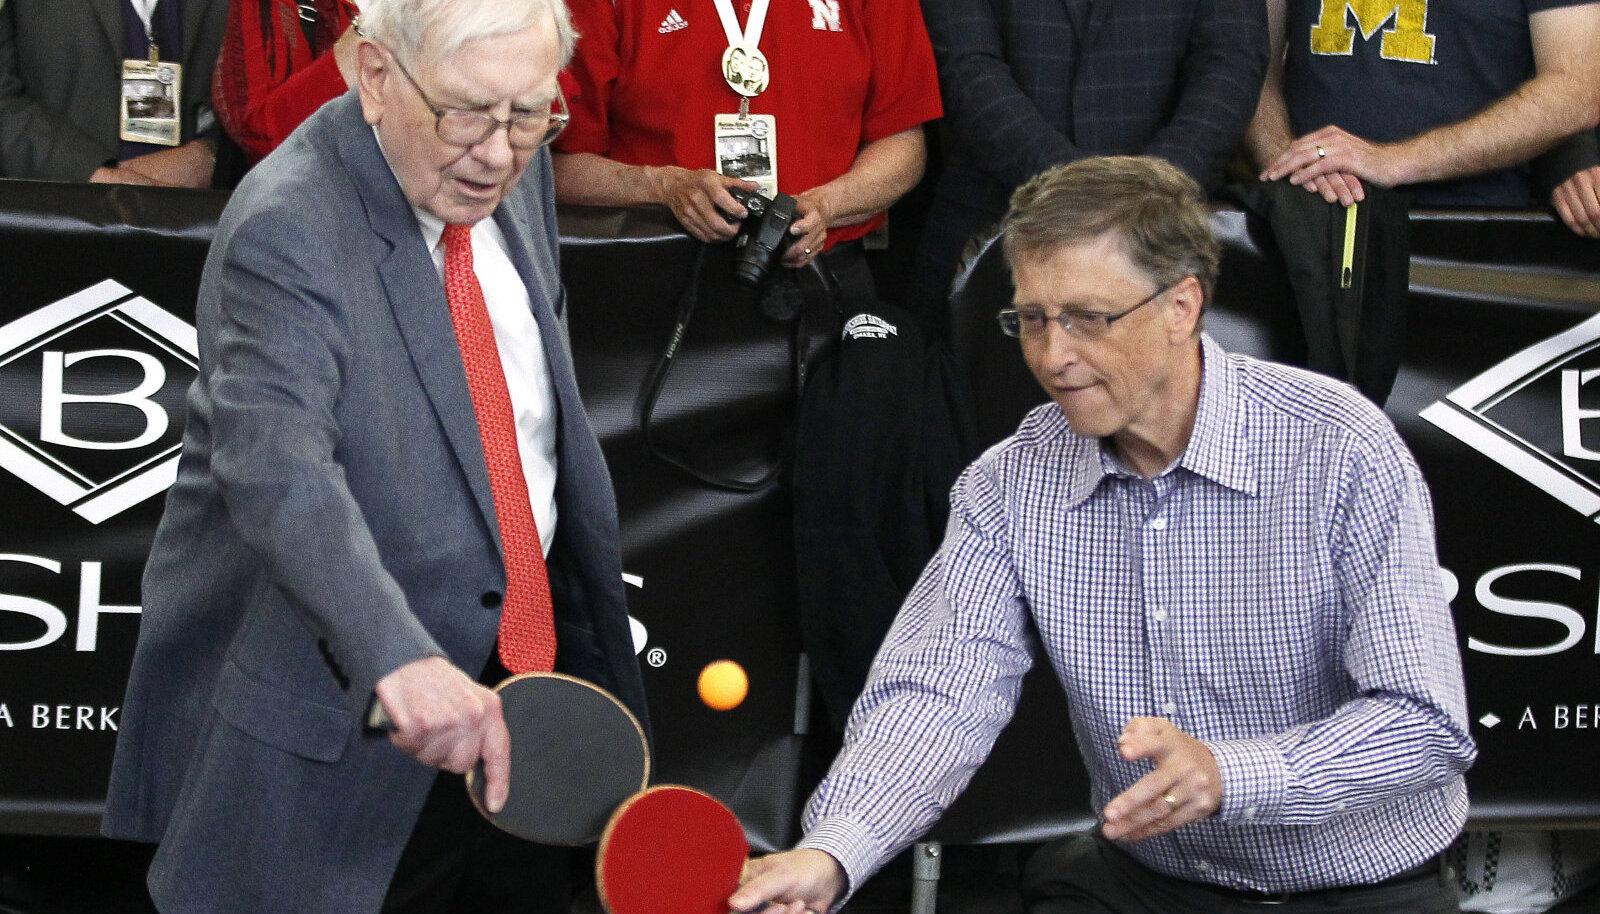 Warren Buffett ja Bill Gates Berkshire Hathaway aktsionäride üldkoosolekul lauatennist mängimas